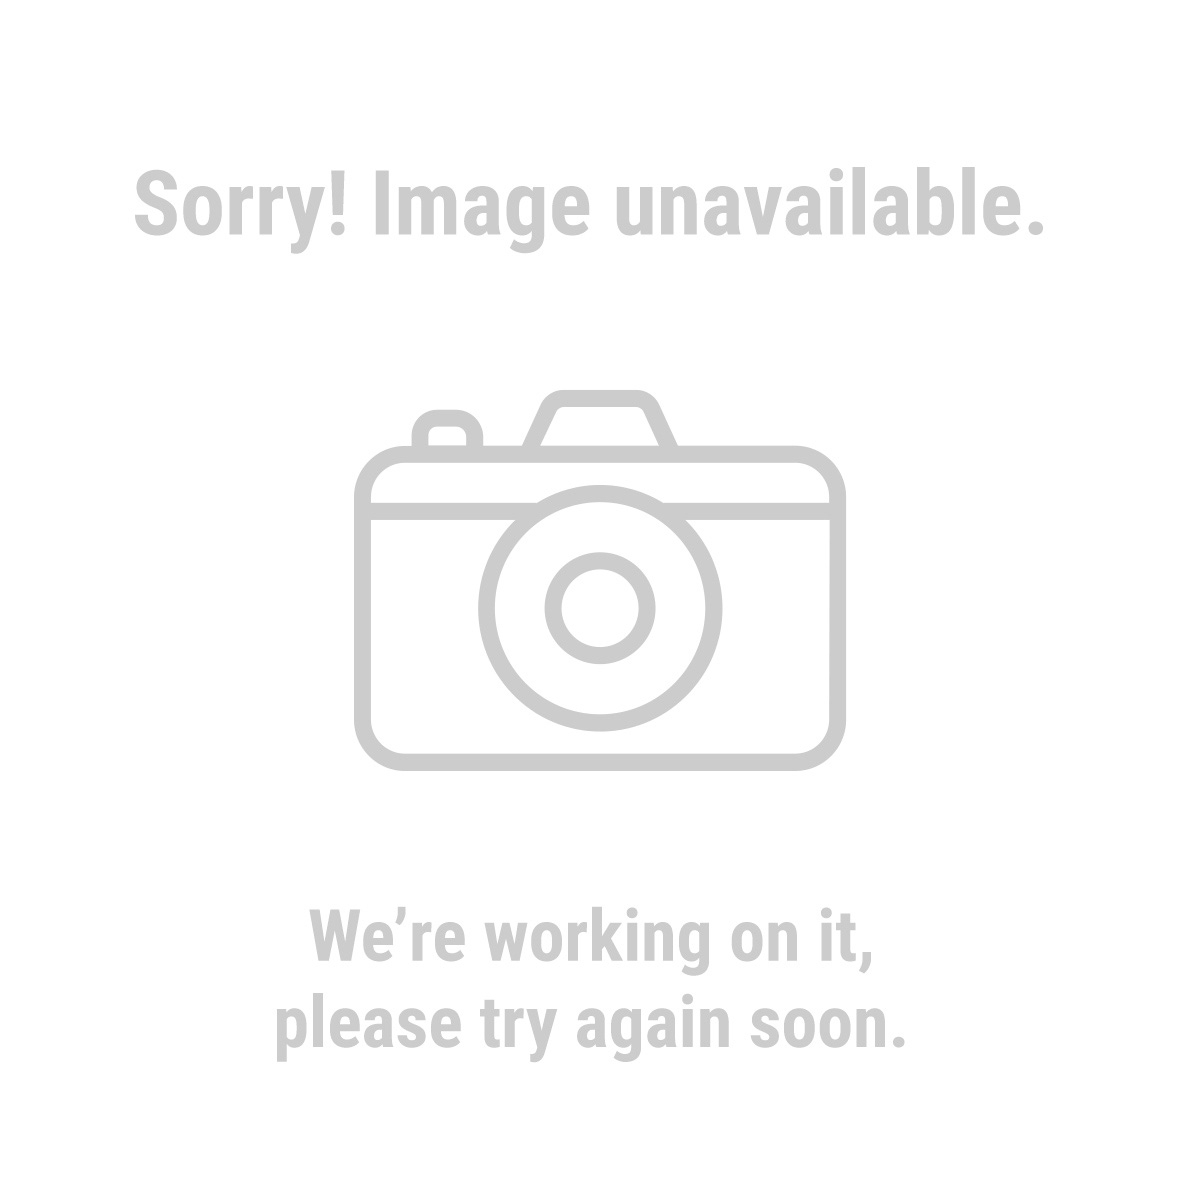 Smith + Jones 68302 3 Horsepower Compressor Duty Motor